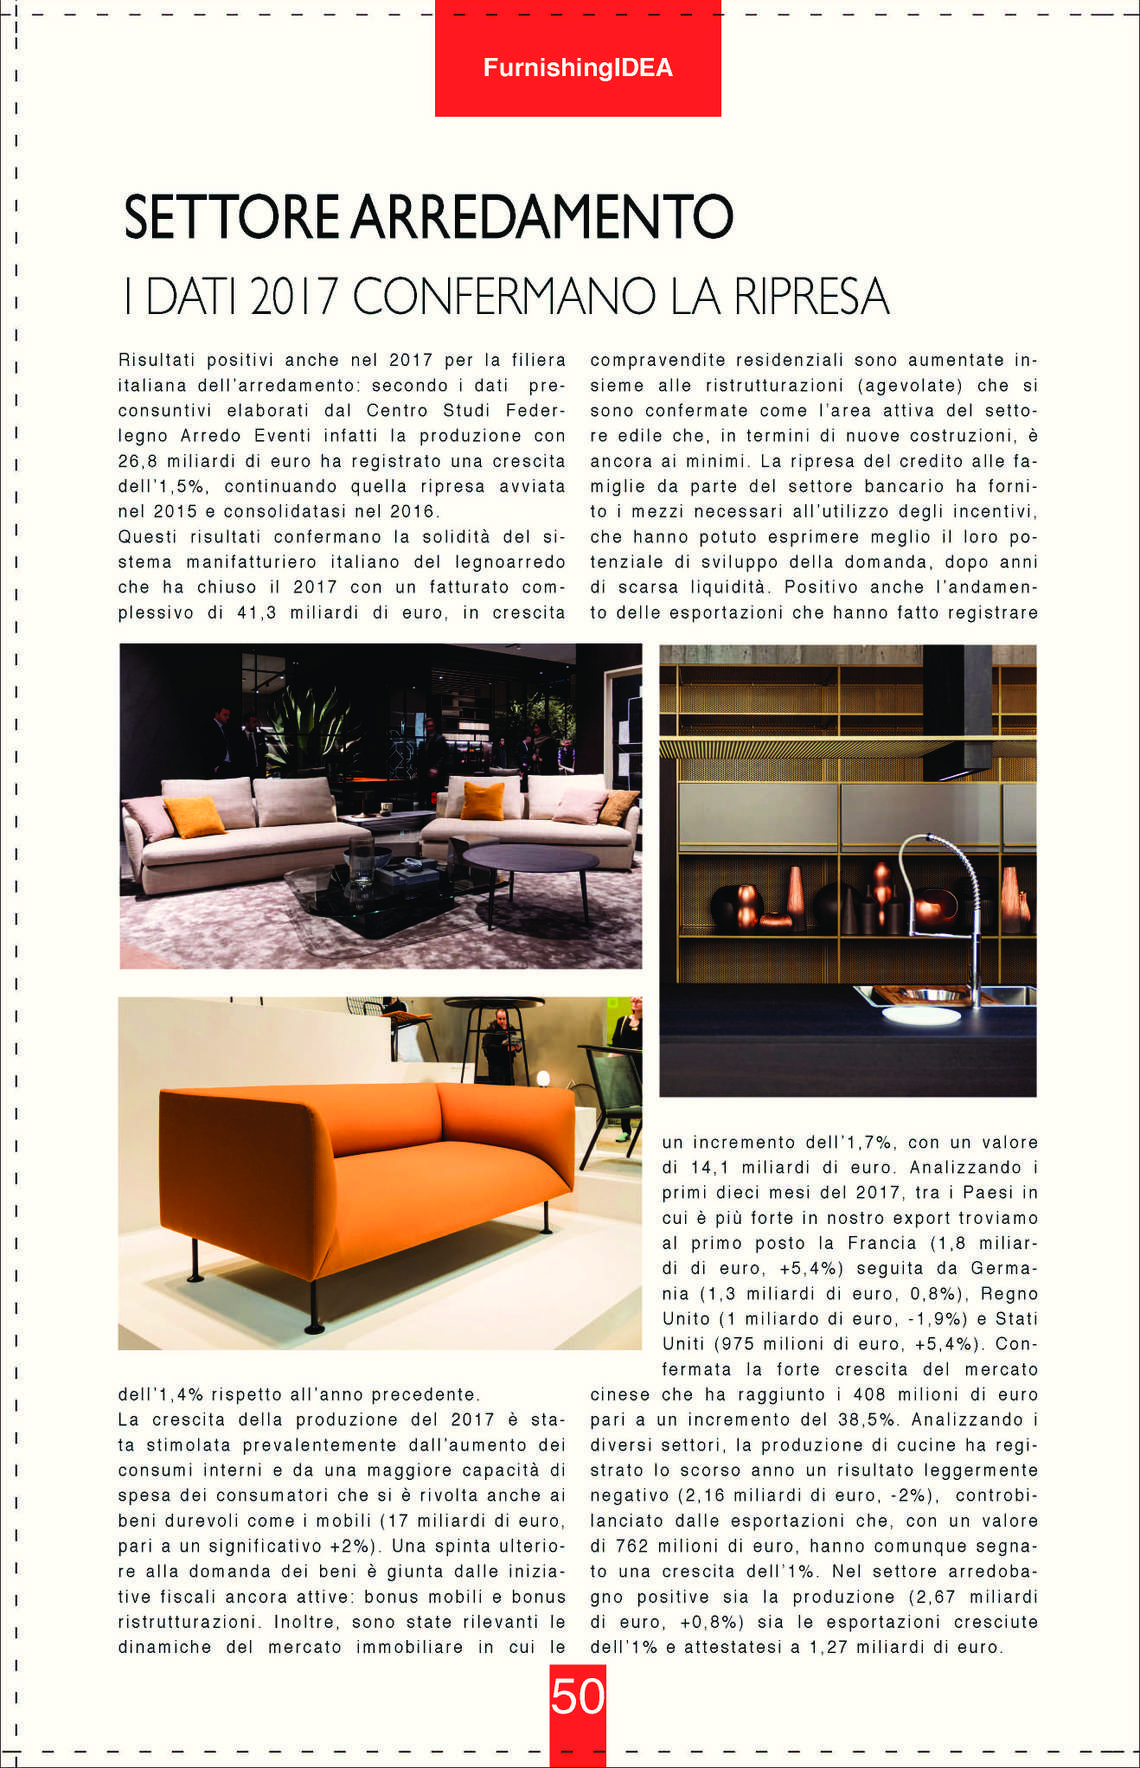 furnishing-idea-journal--1-2018_journal_9_049.jpg